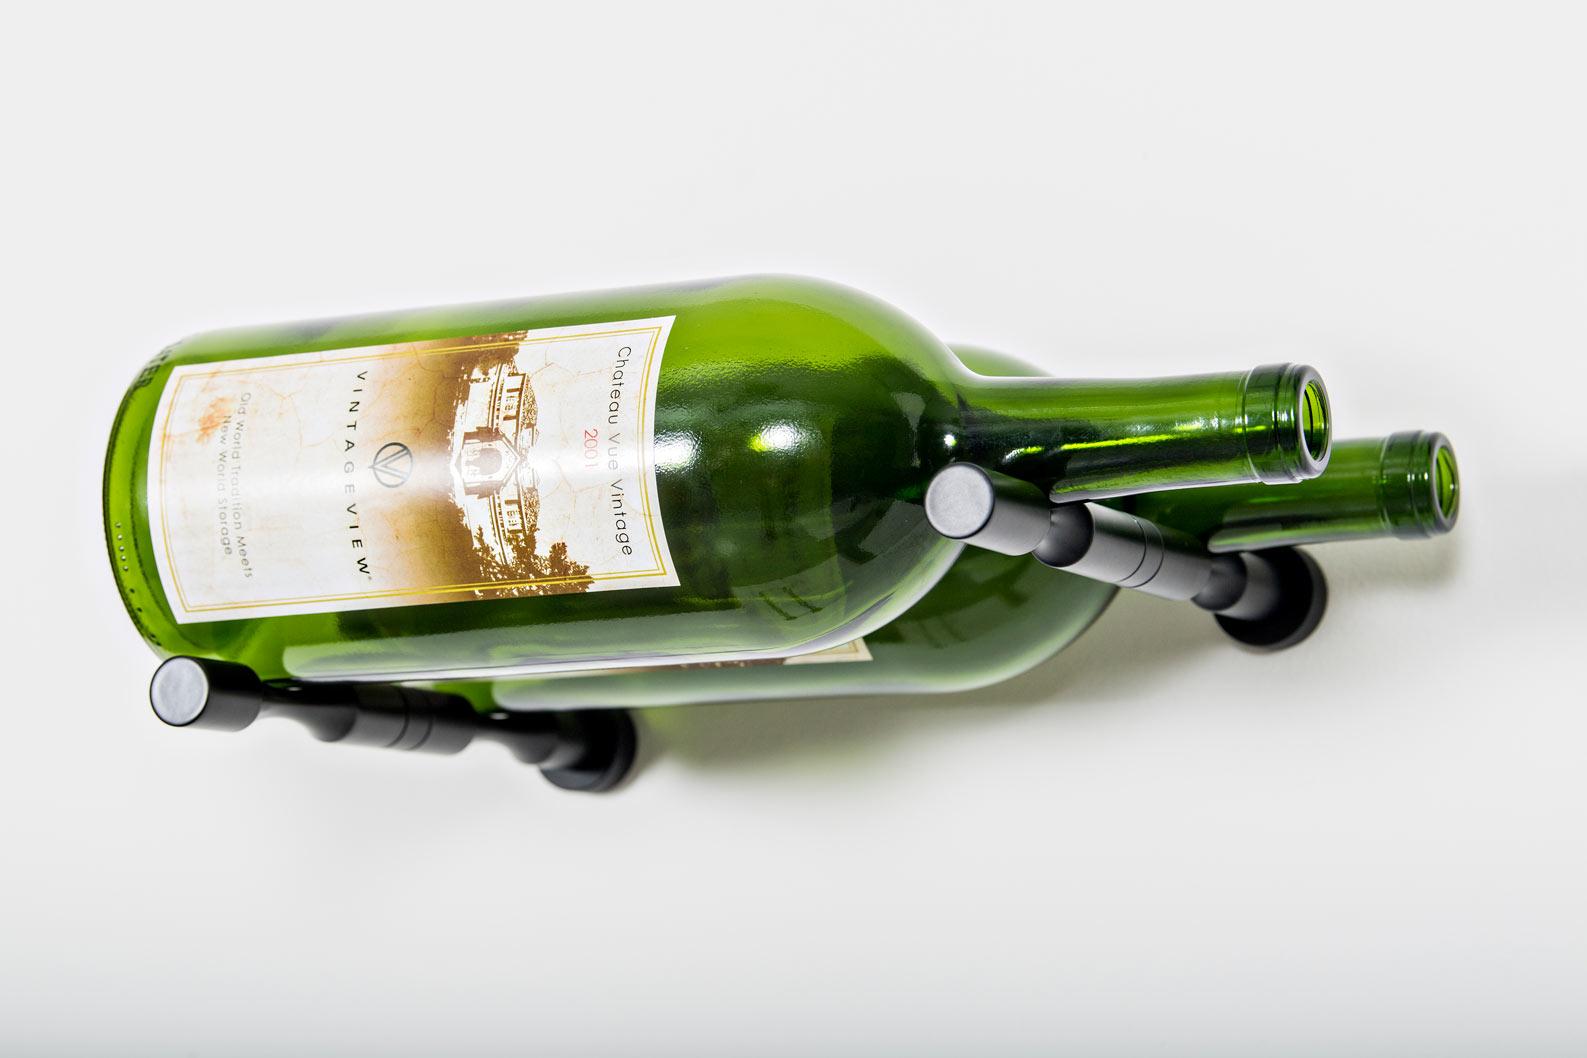 Vino Pins Magnum Or Champagne 2 Bottle Metal Wine Rack Kit Vintageview